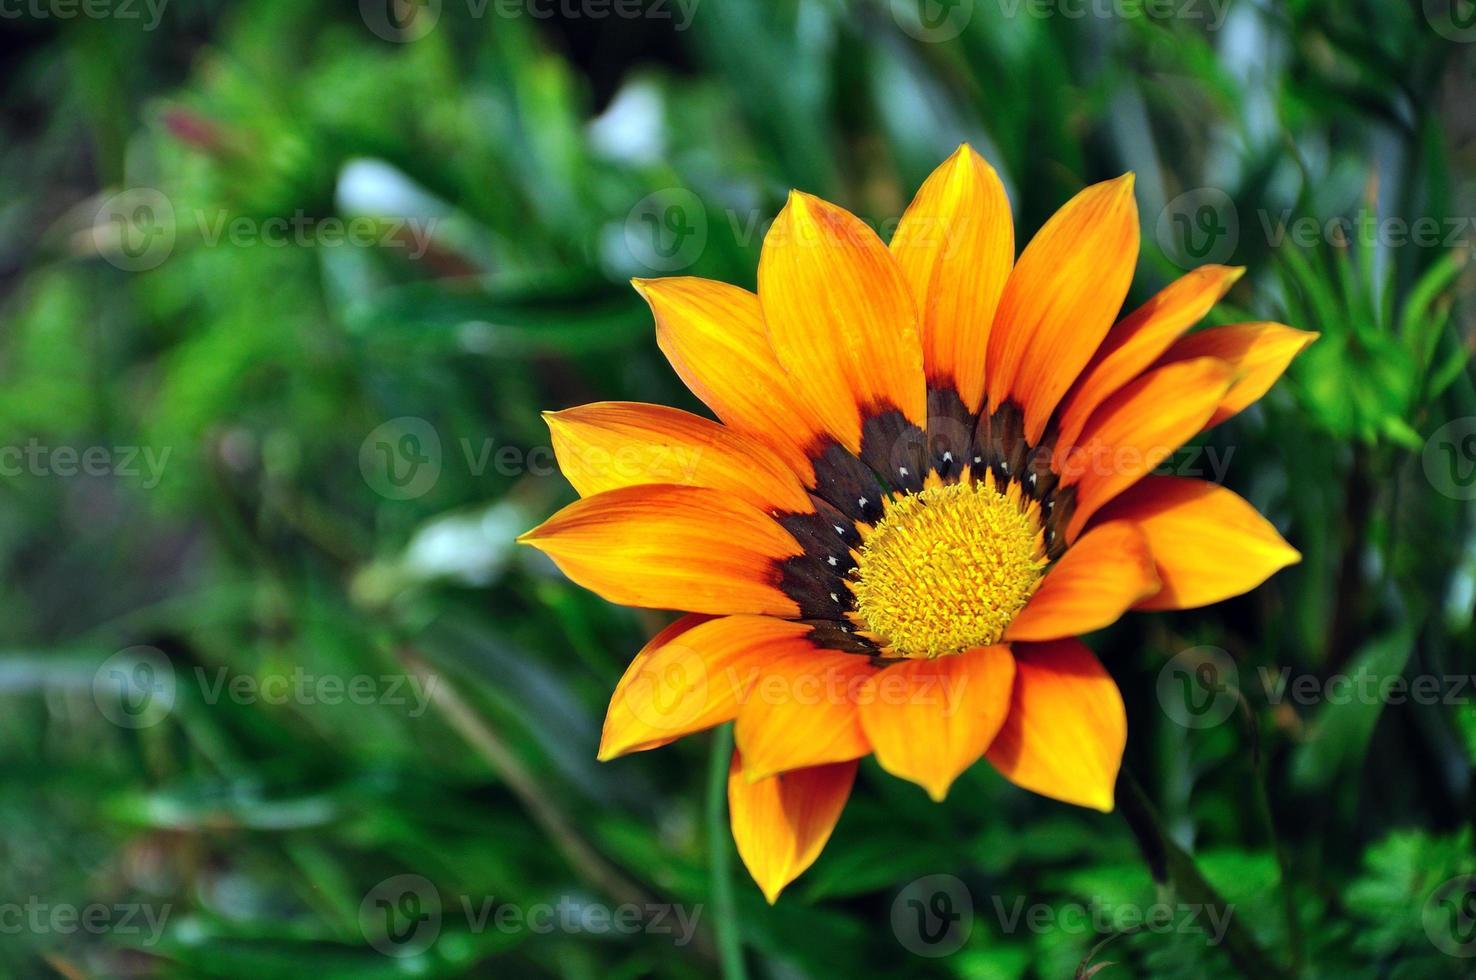 oranje gazania daisy flower close-up met kopie ruimte foto